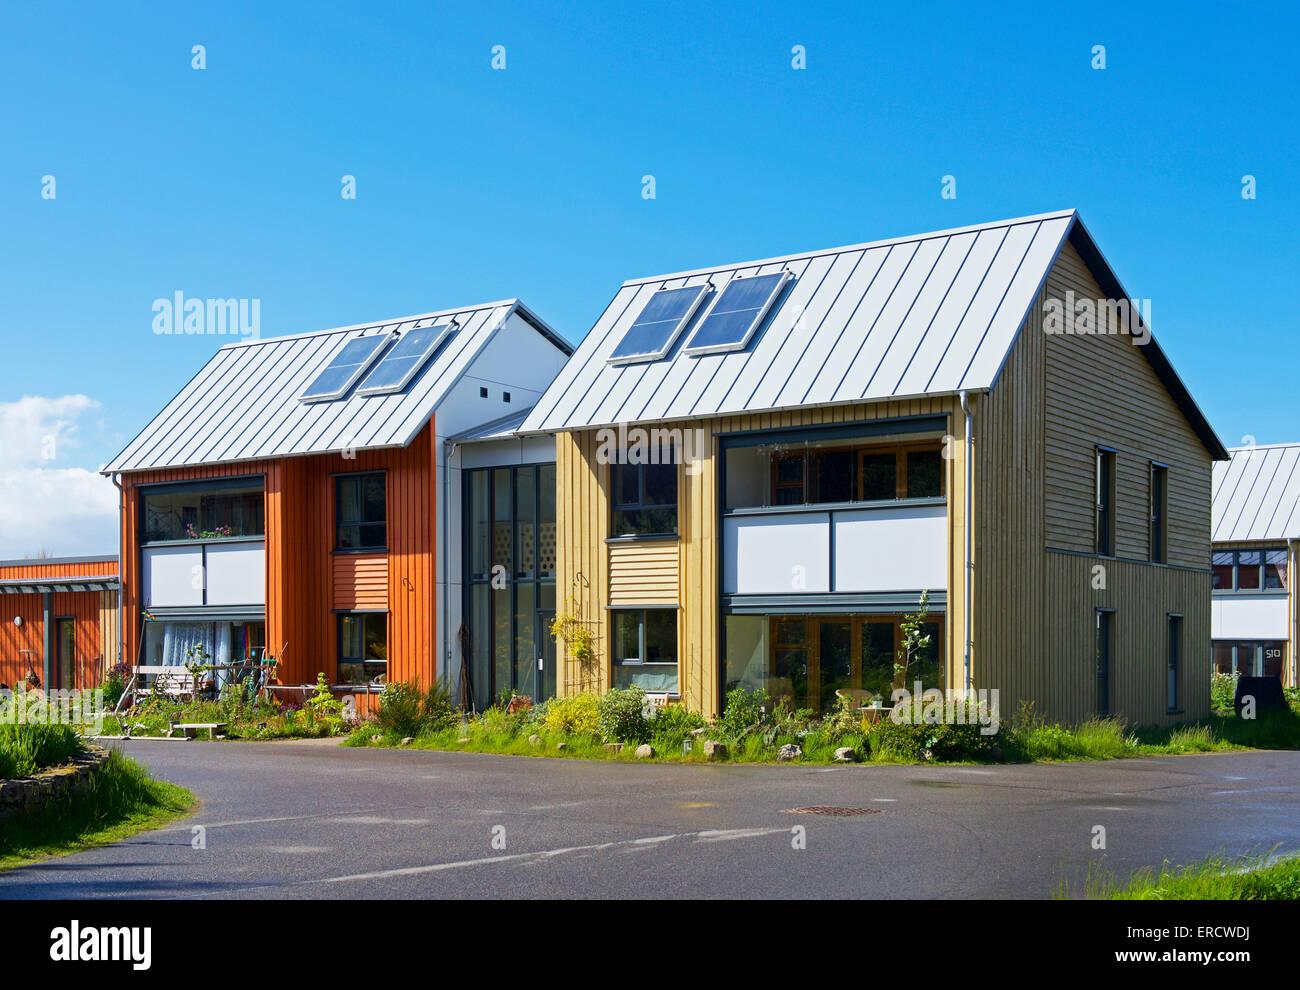 Houses in eco-village, Findhorn Foundation, Moray, Scotland UK - Stock Image